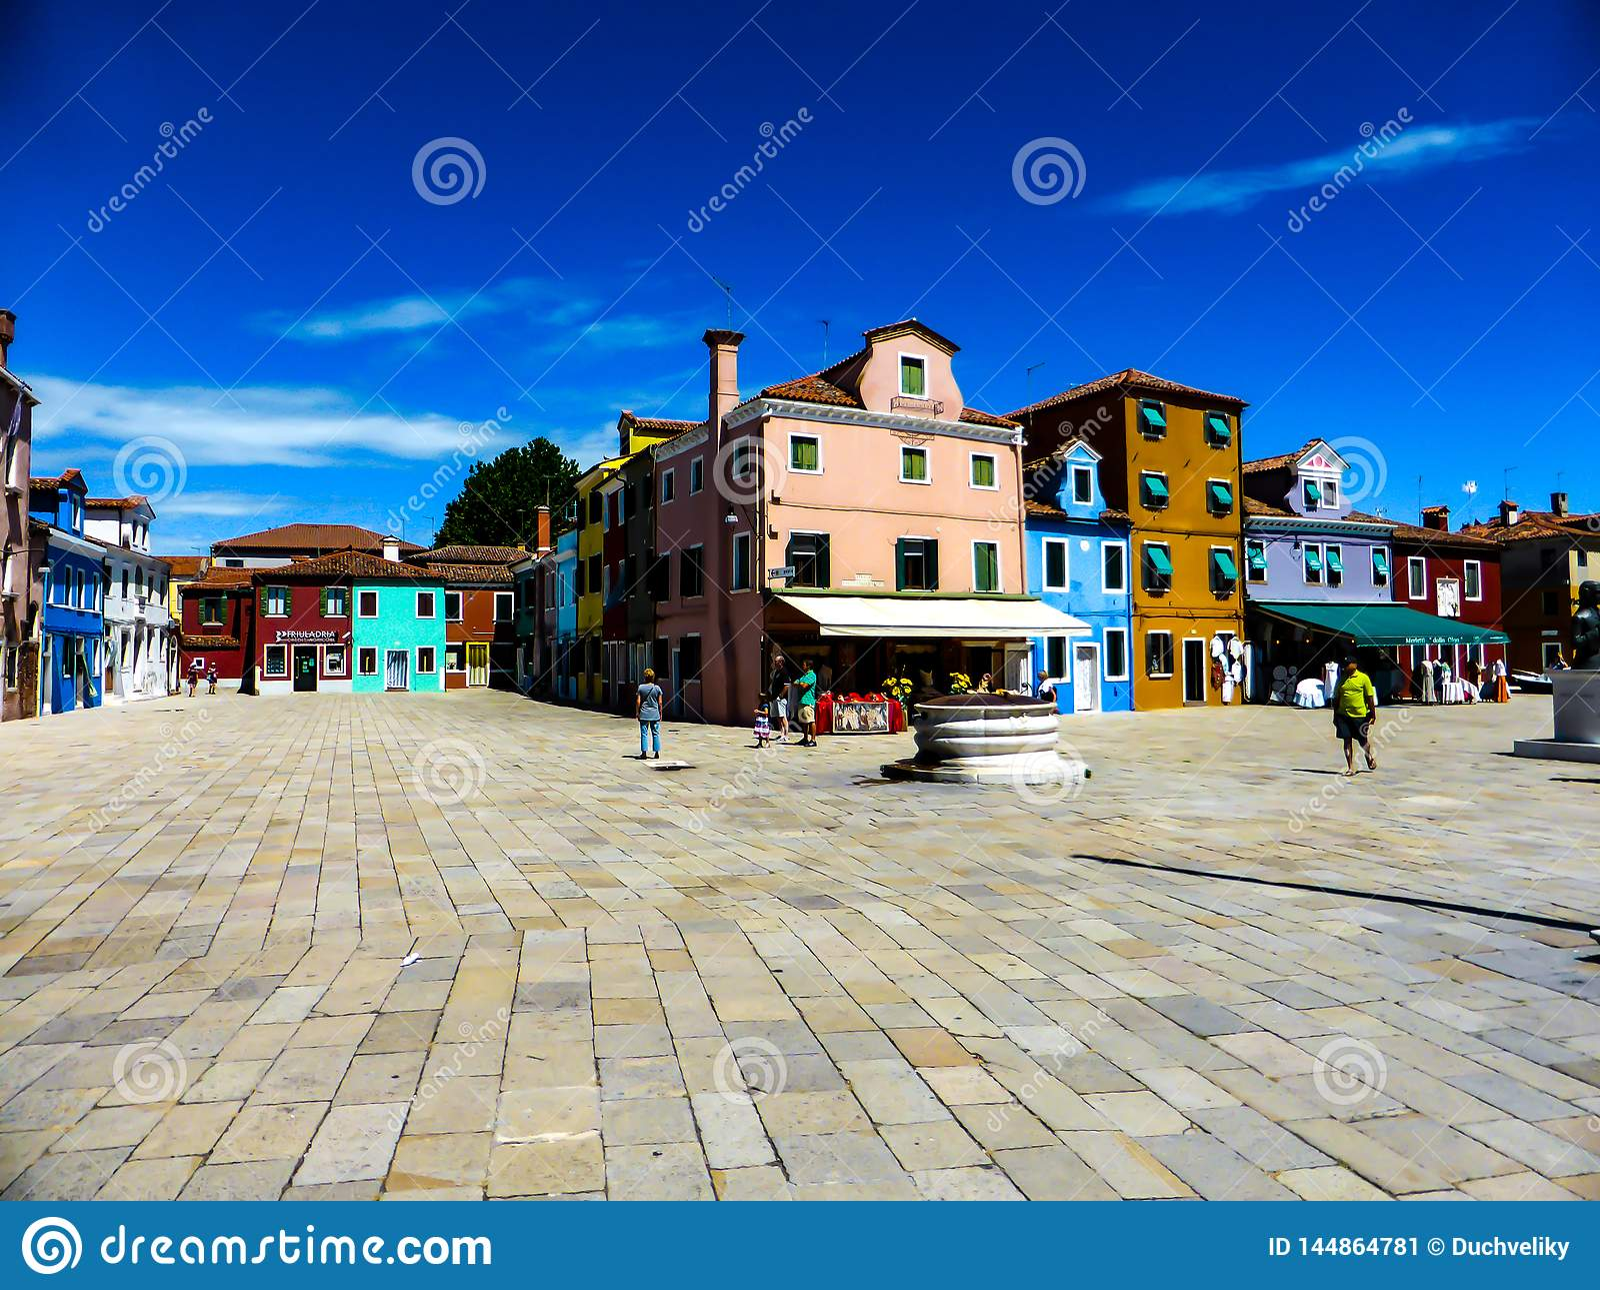 Schönes Foto von Murano - Venedig Italien